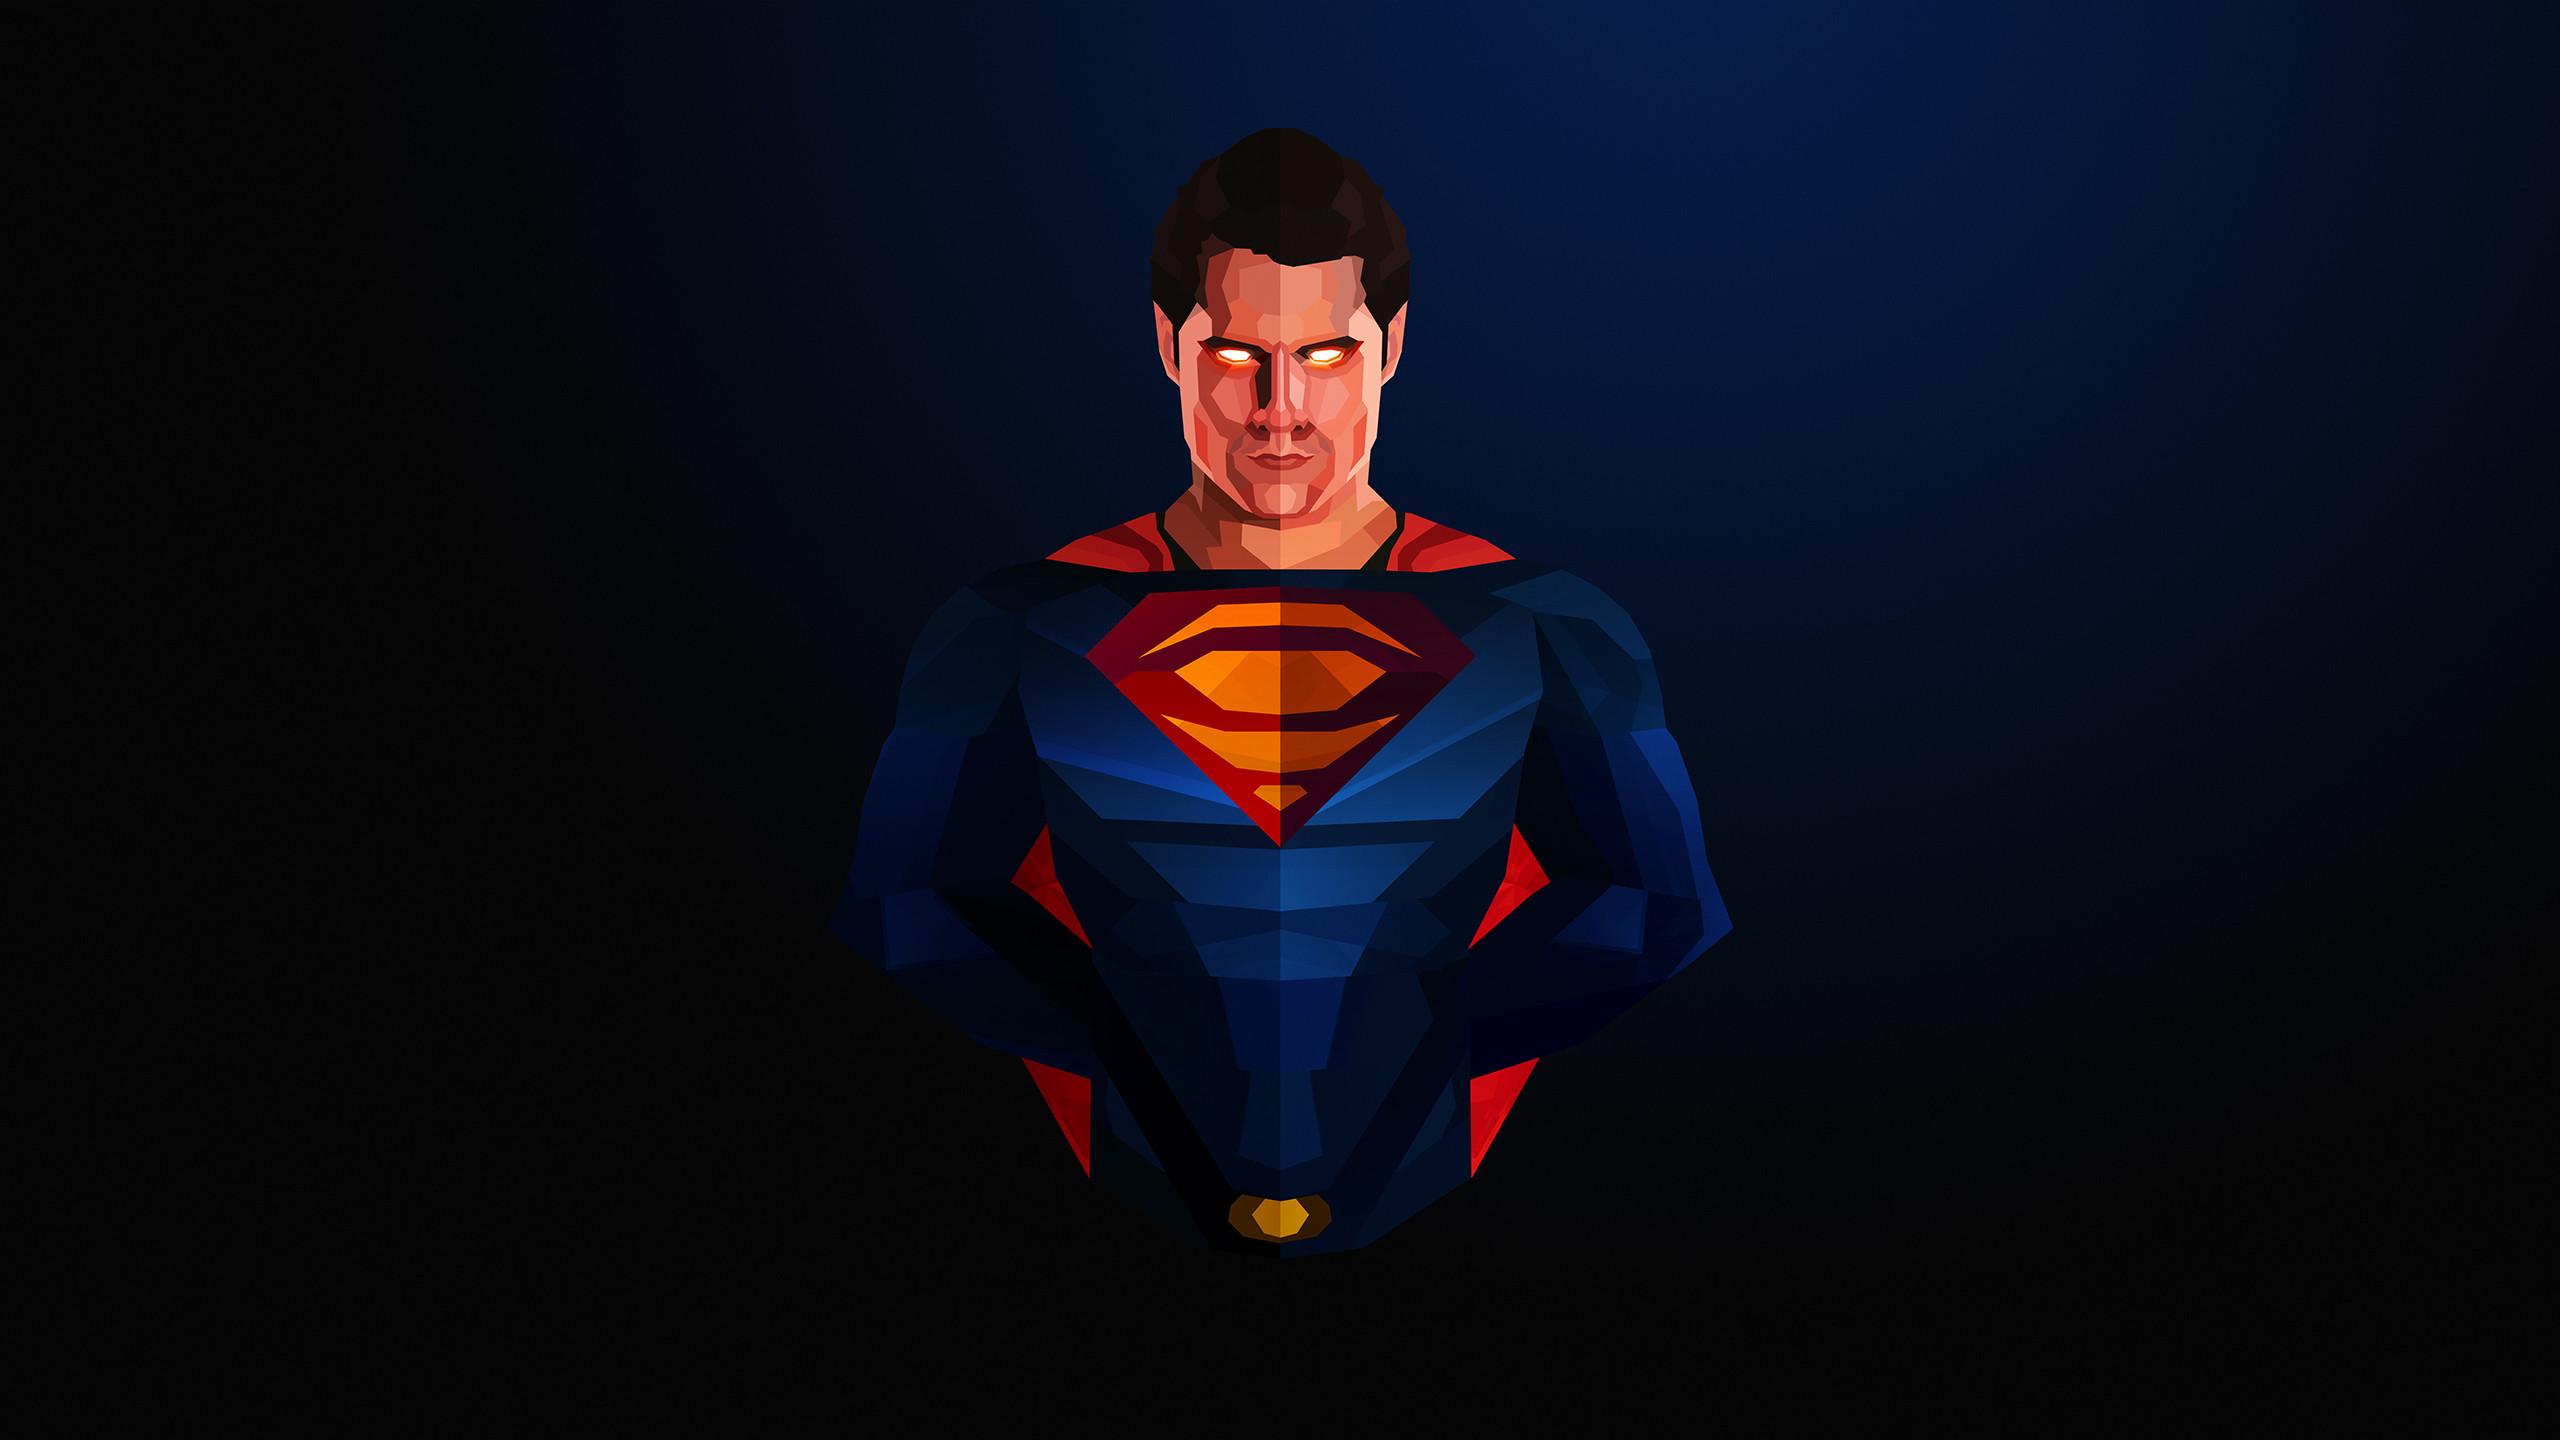 Creative Graphics / Superman Wallpaper